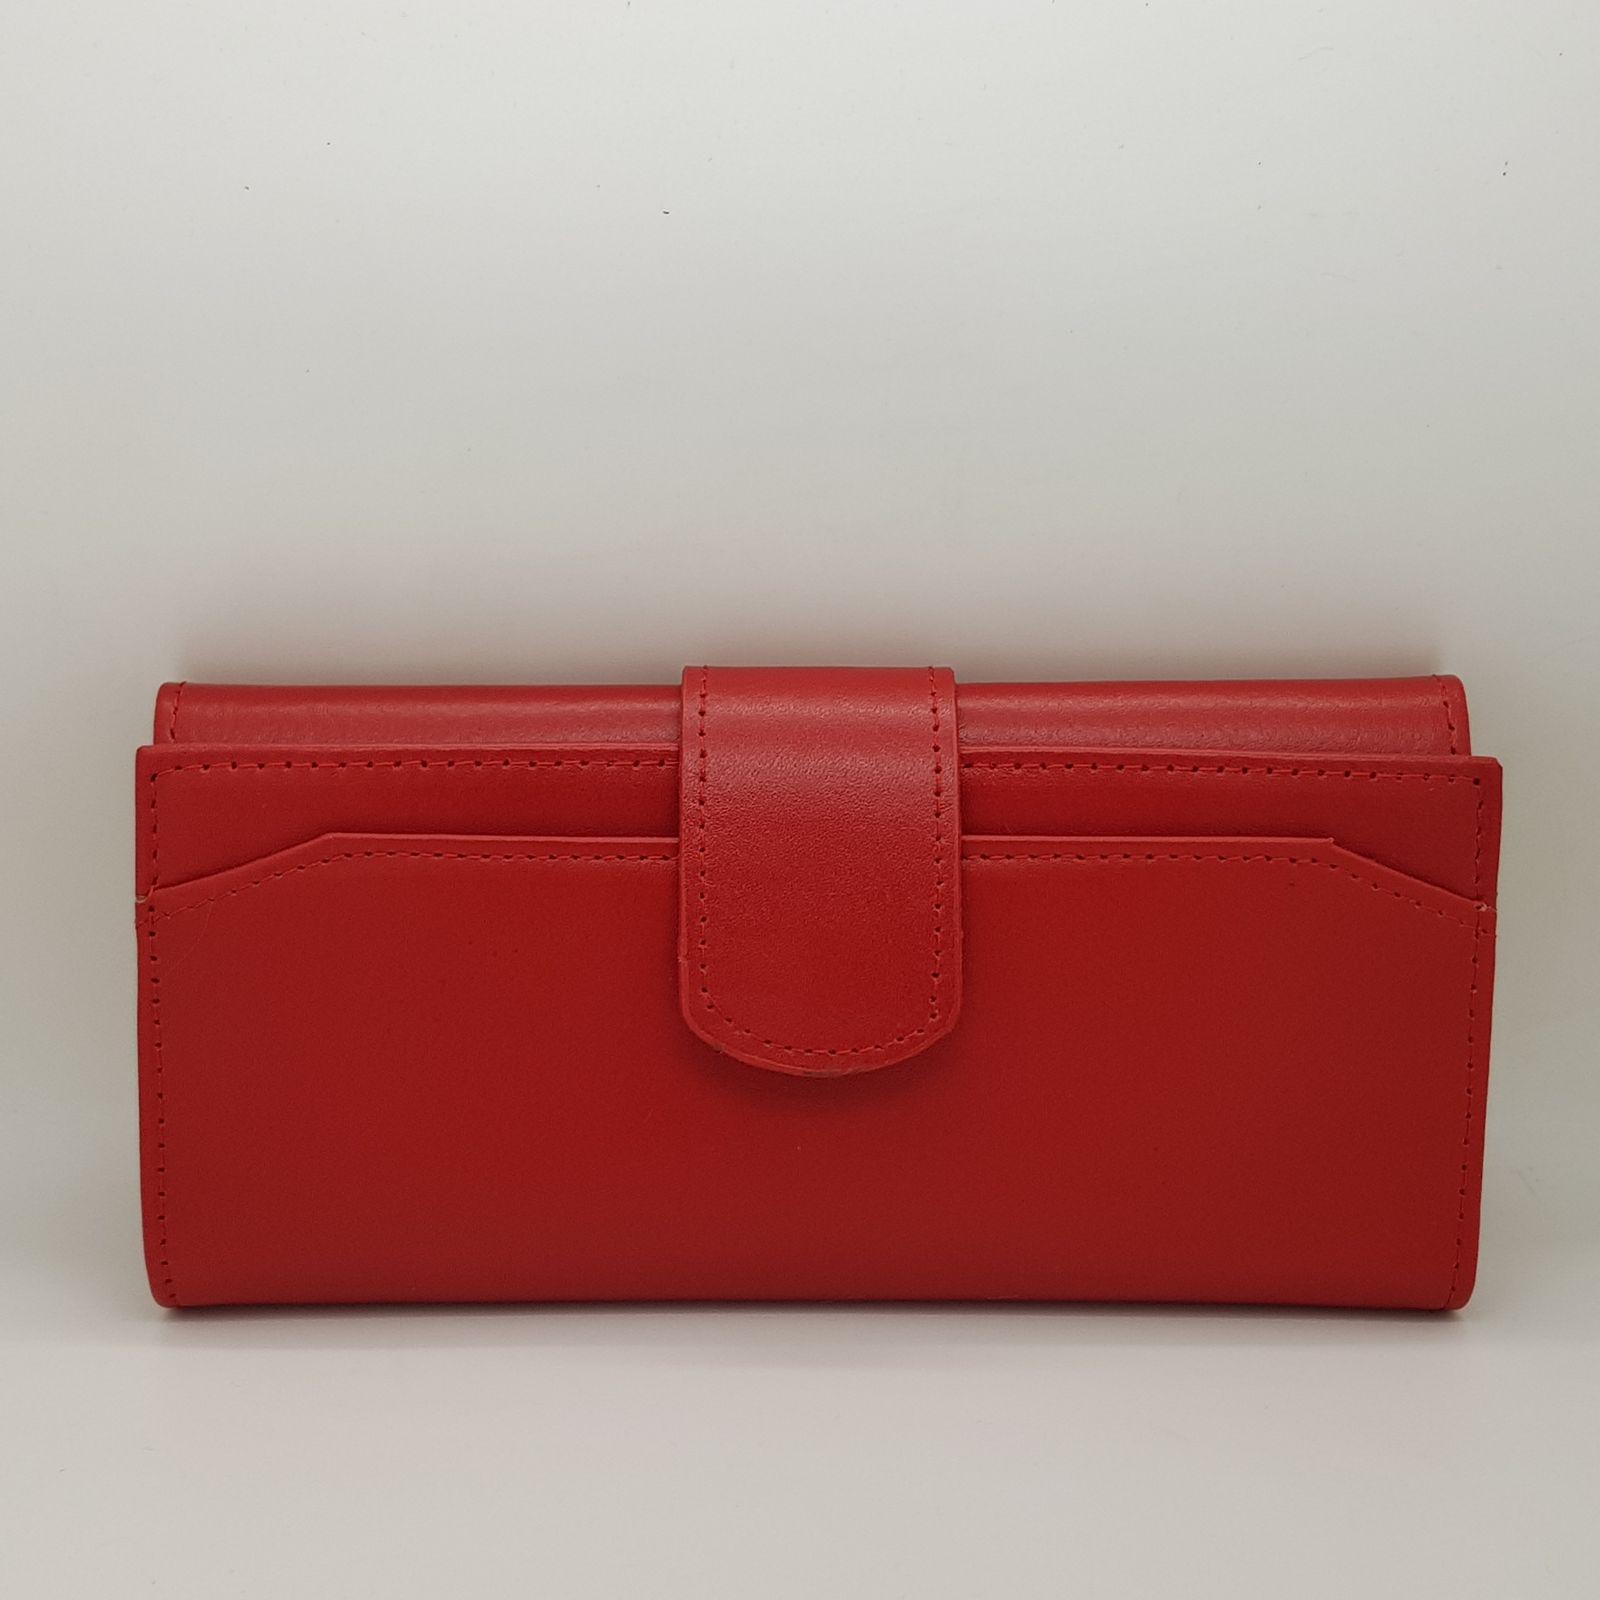 کیف پول زنانه چرم دیاکو مدل 315 -  - 5